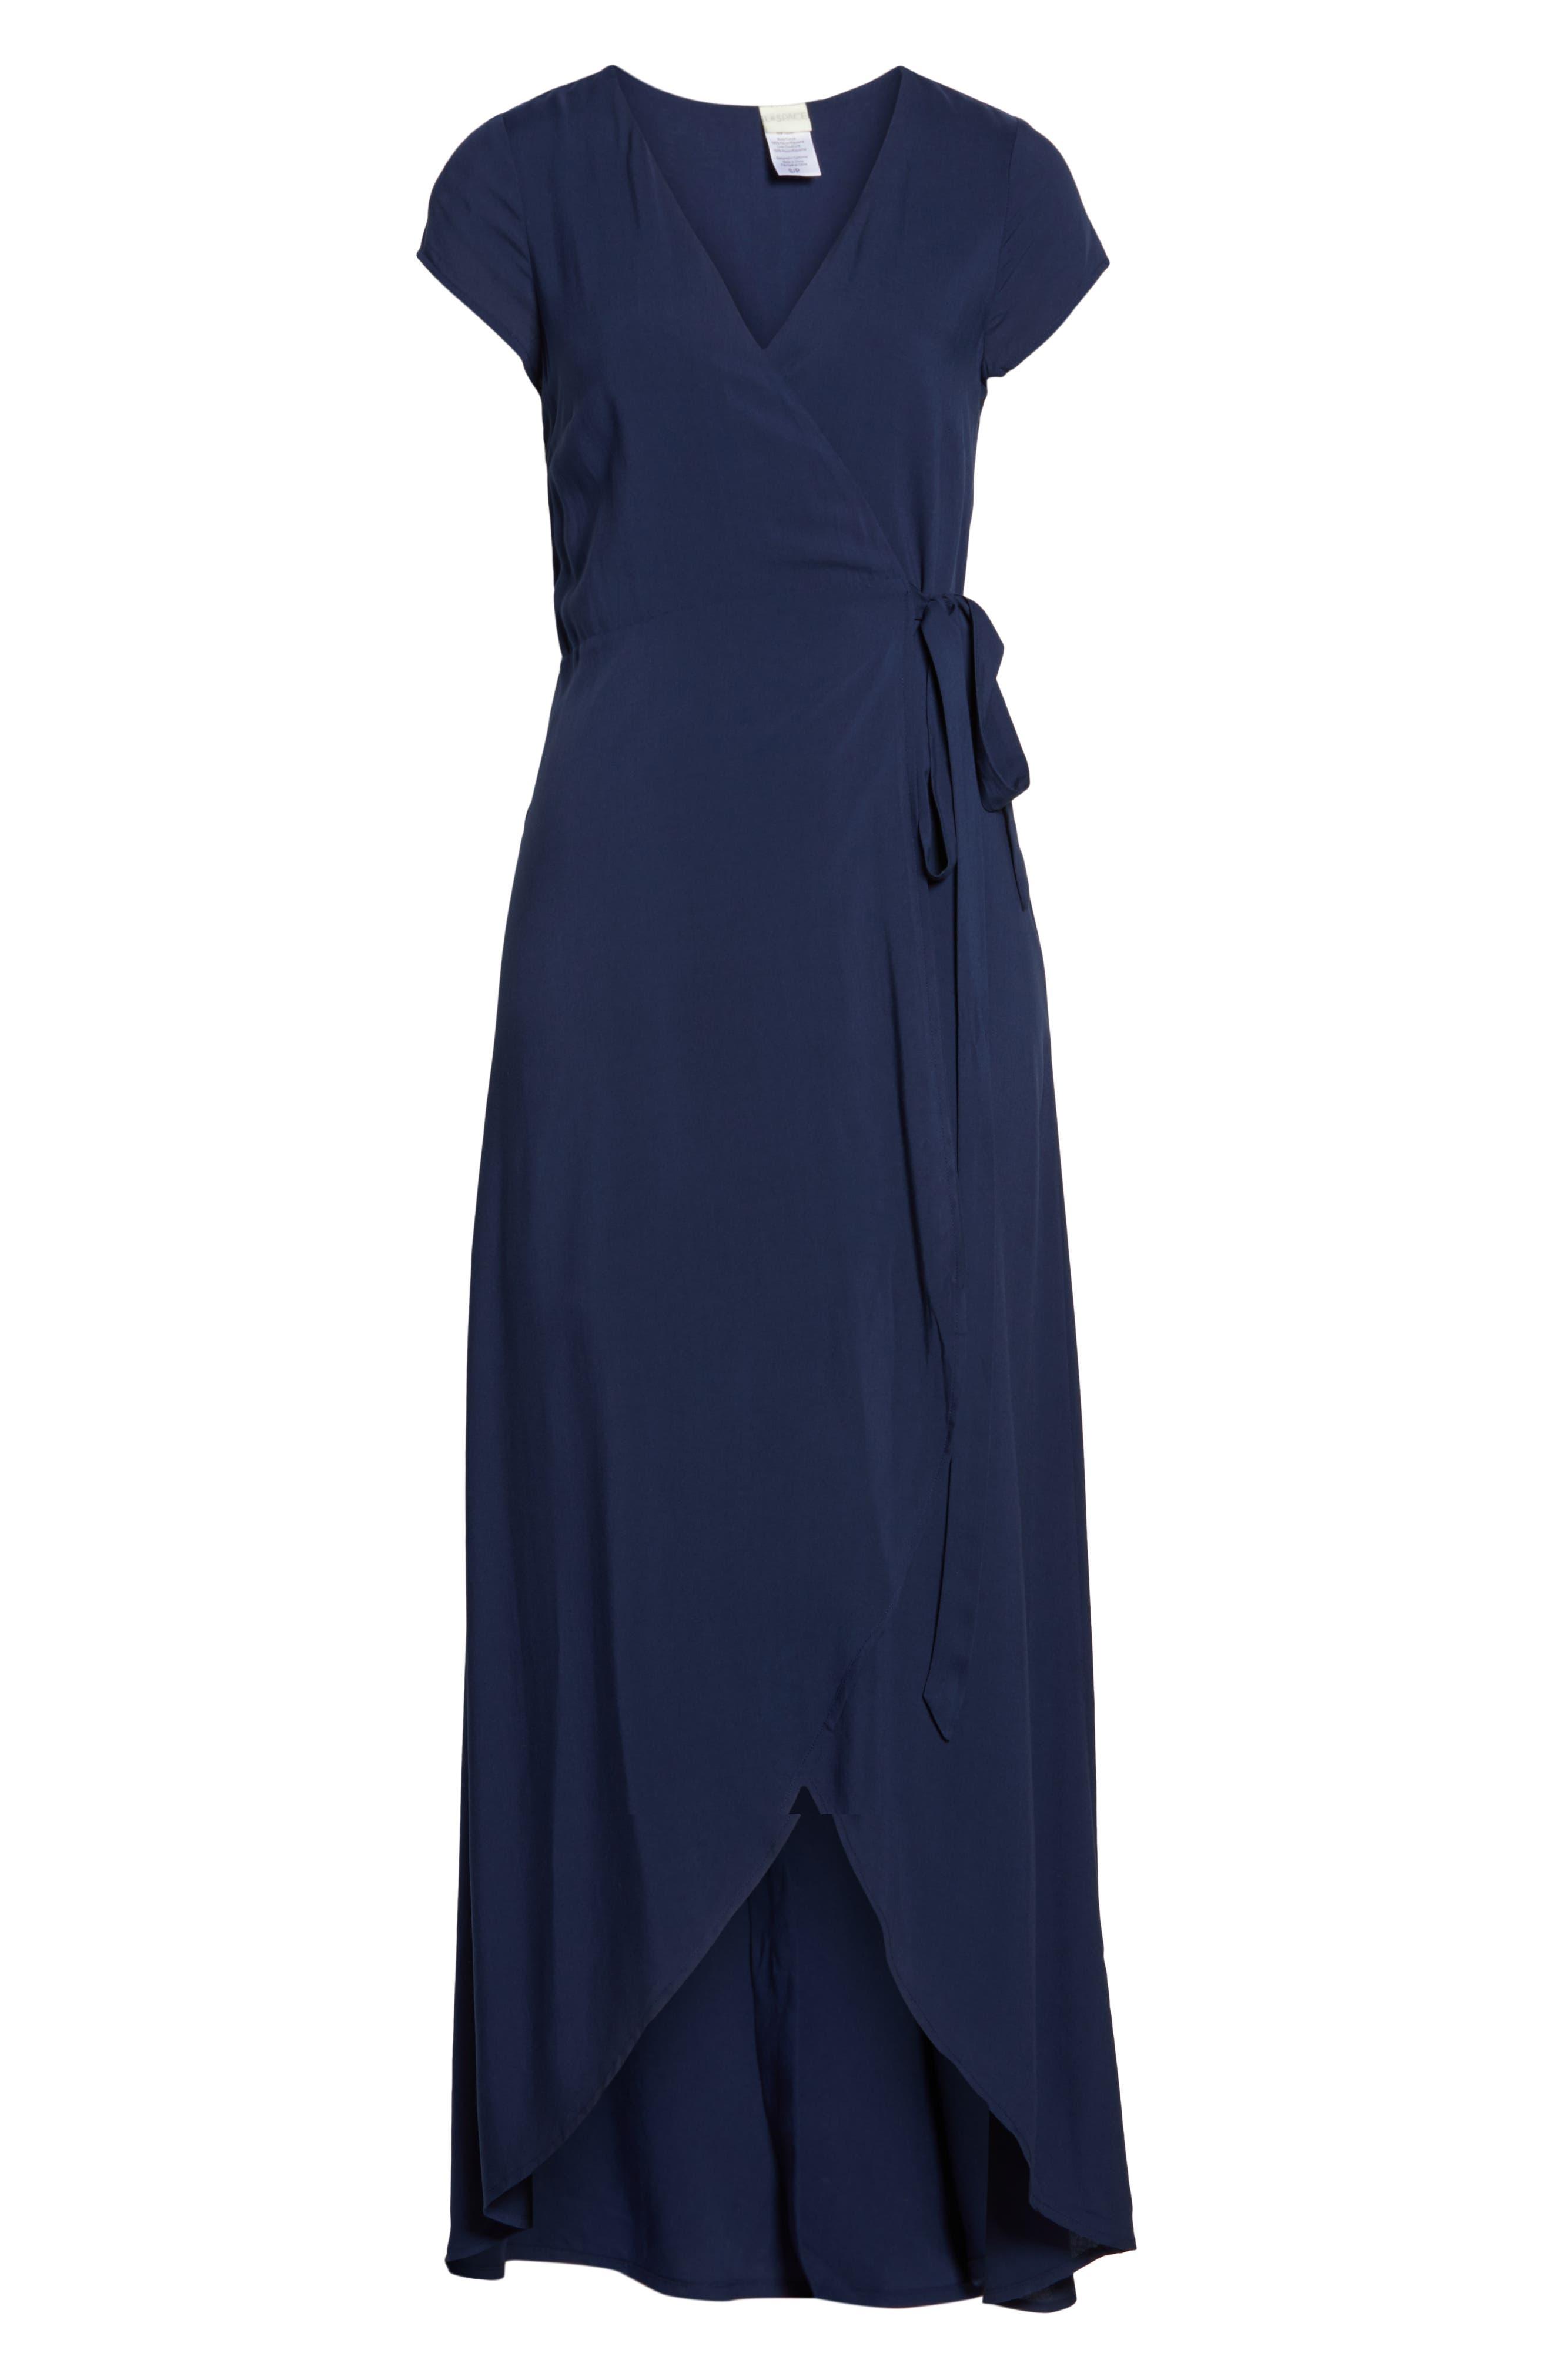 Goa Cover-Up Maxi Wrap Dress,                             Alternate thumbnail 6, color,                             MIDNIGHT BLUE